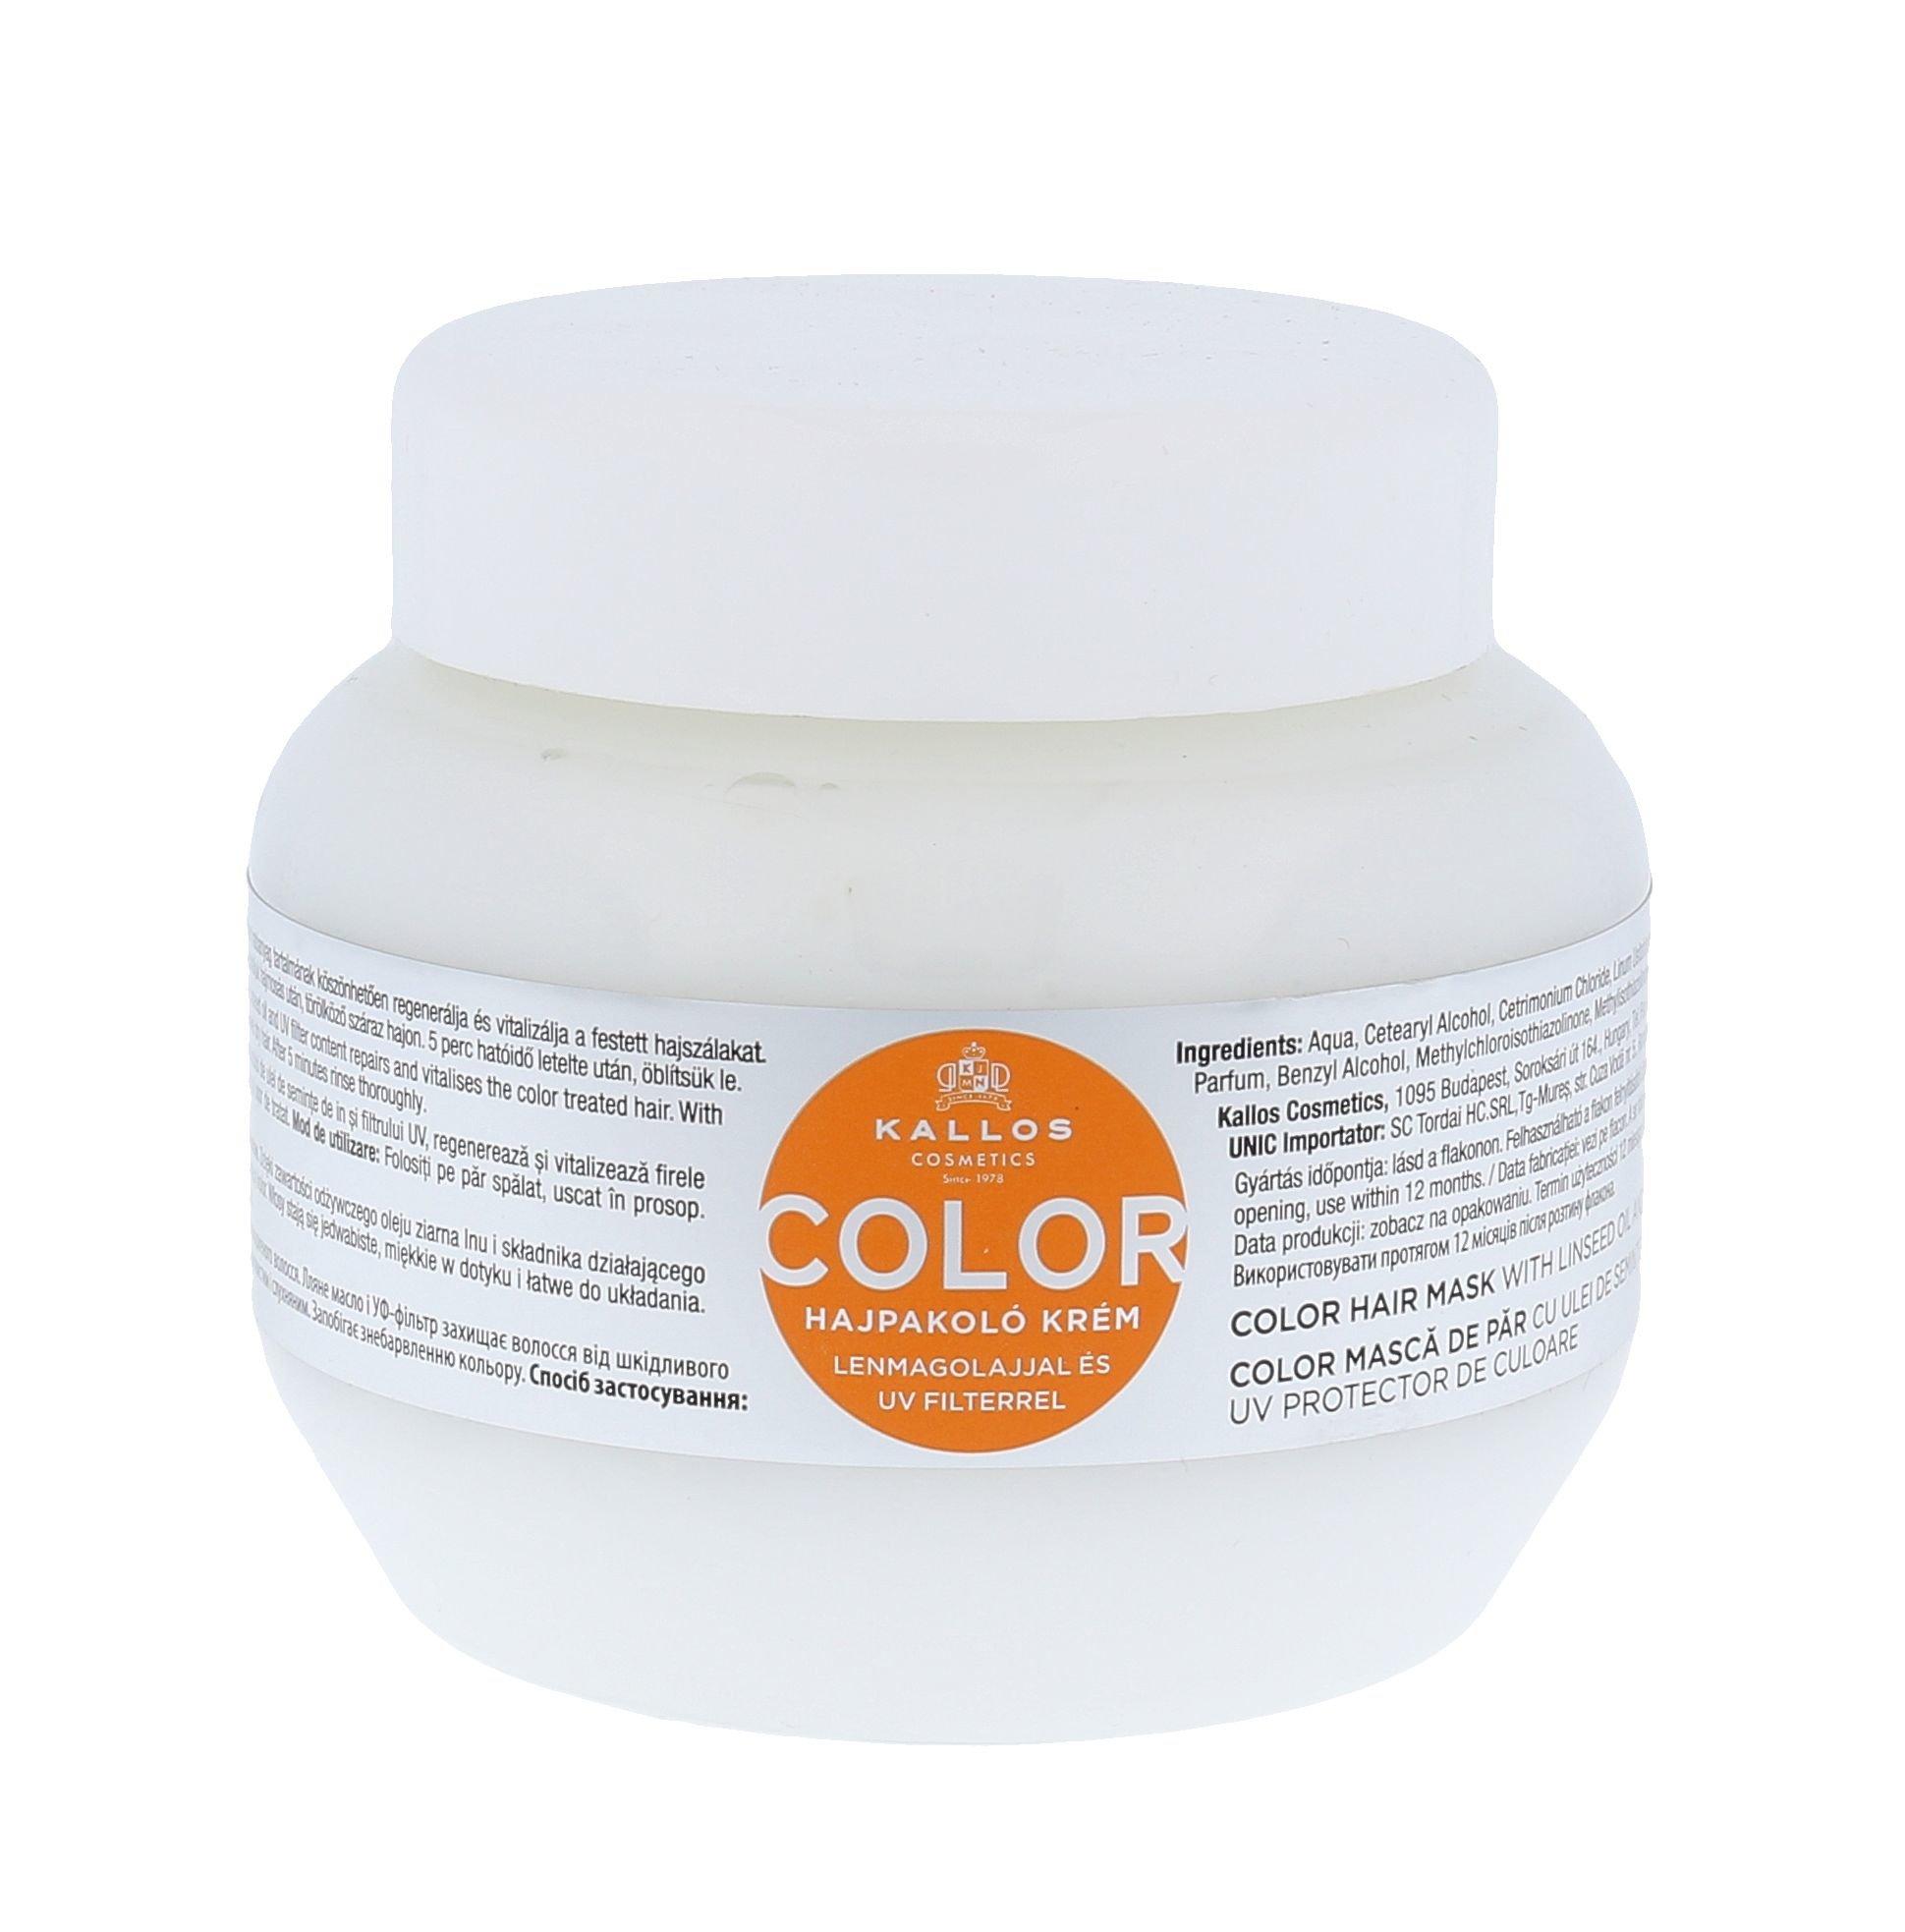 Kallos Cosmetics Color Cosmetic 275ml